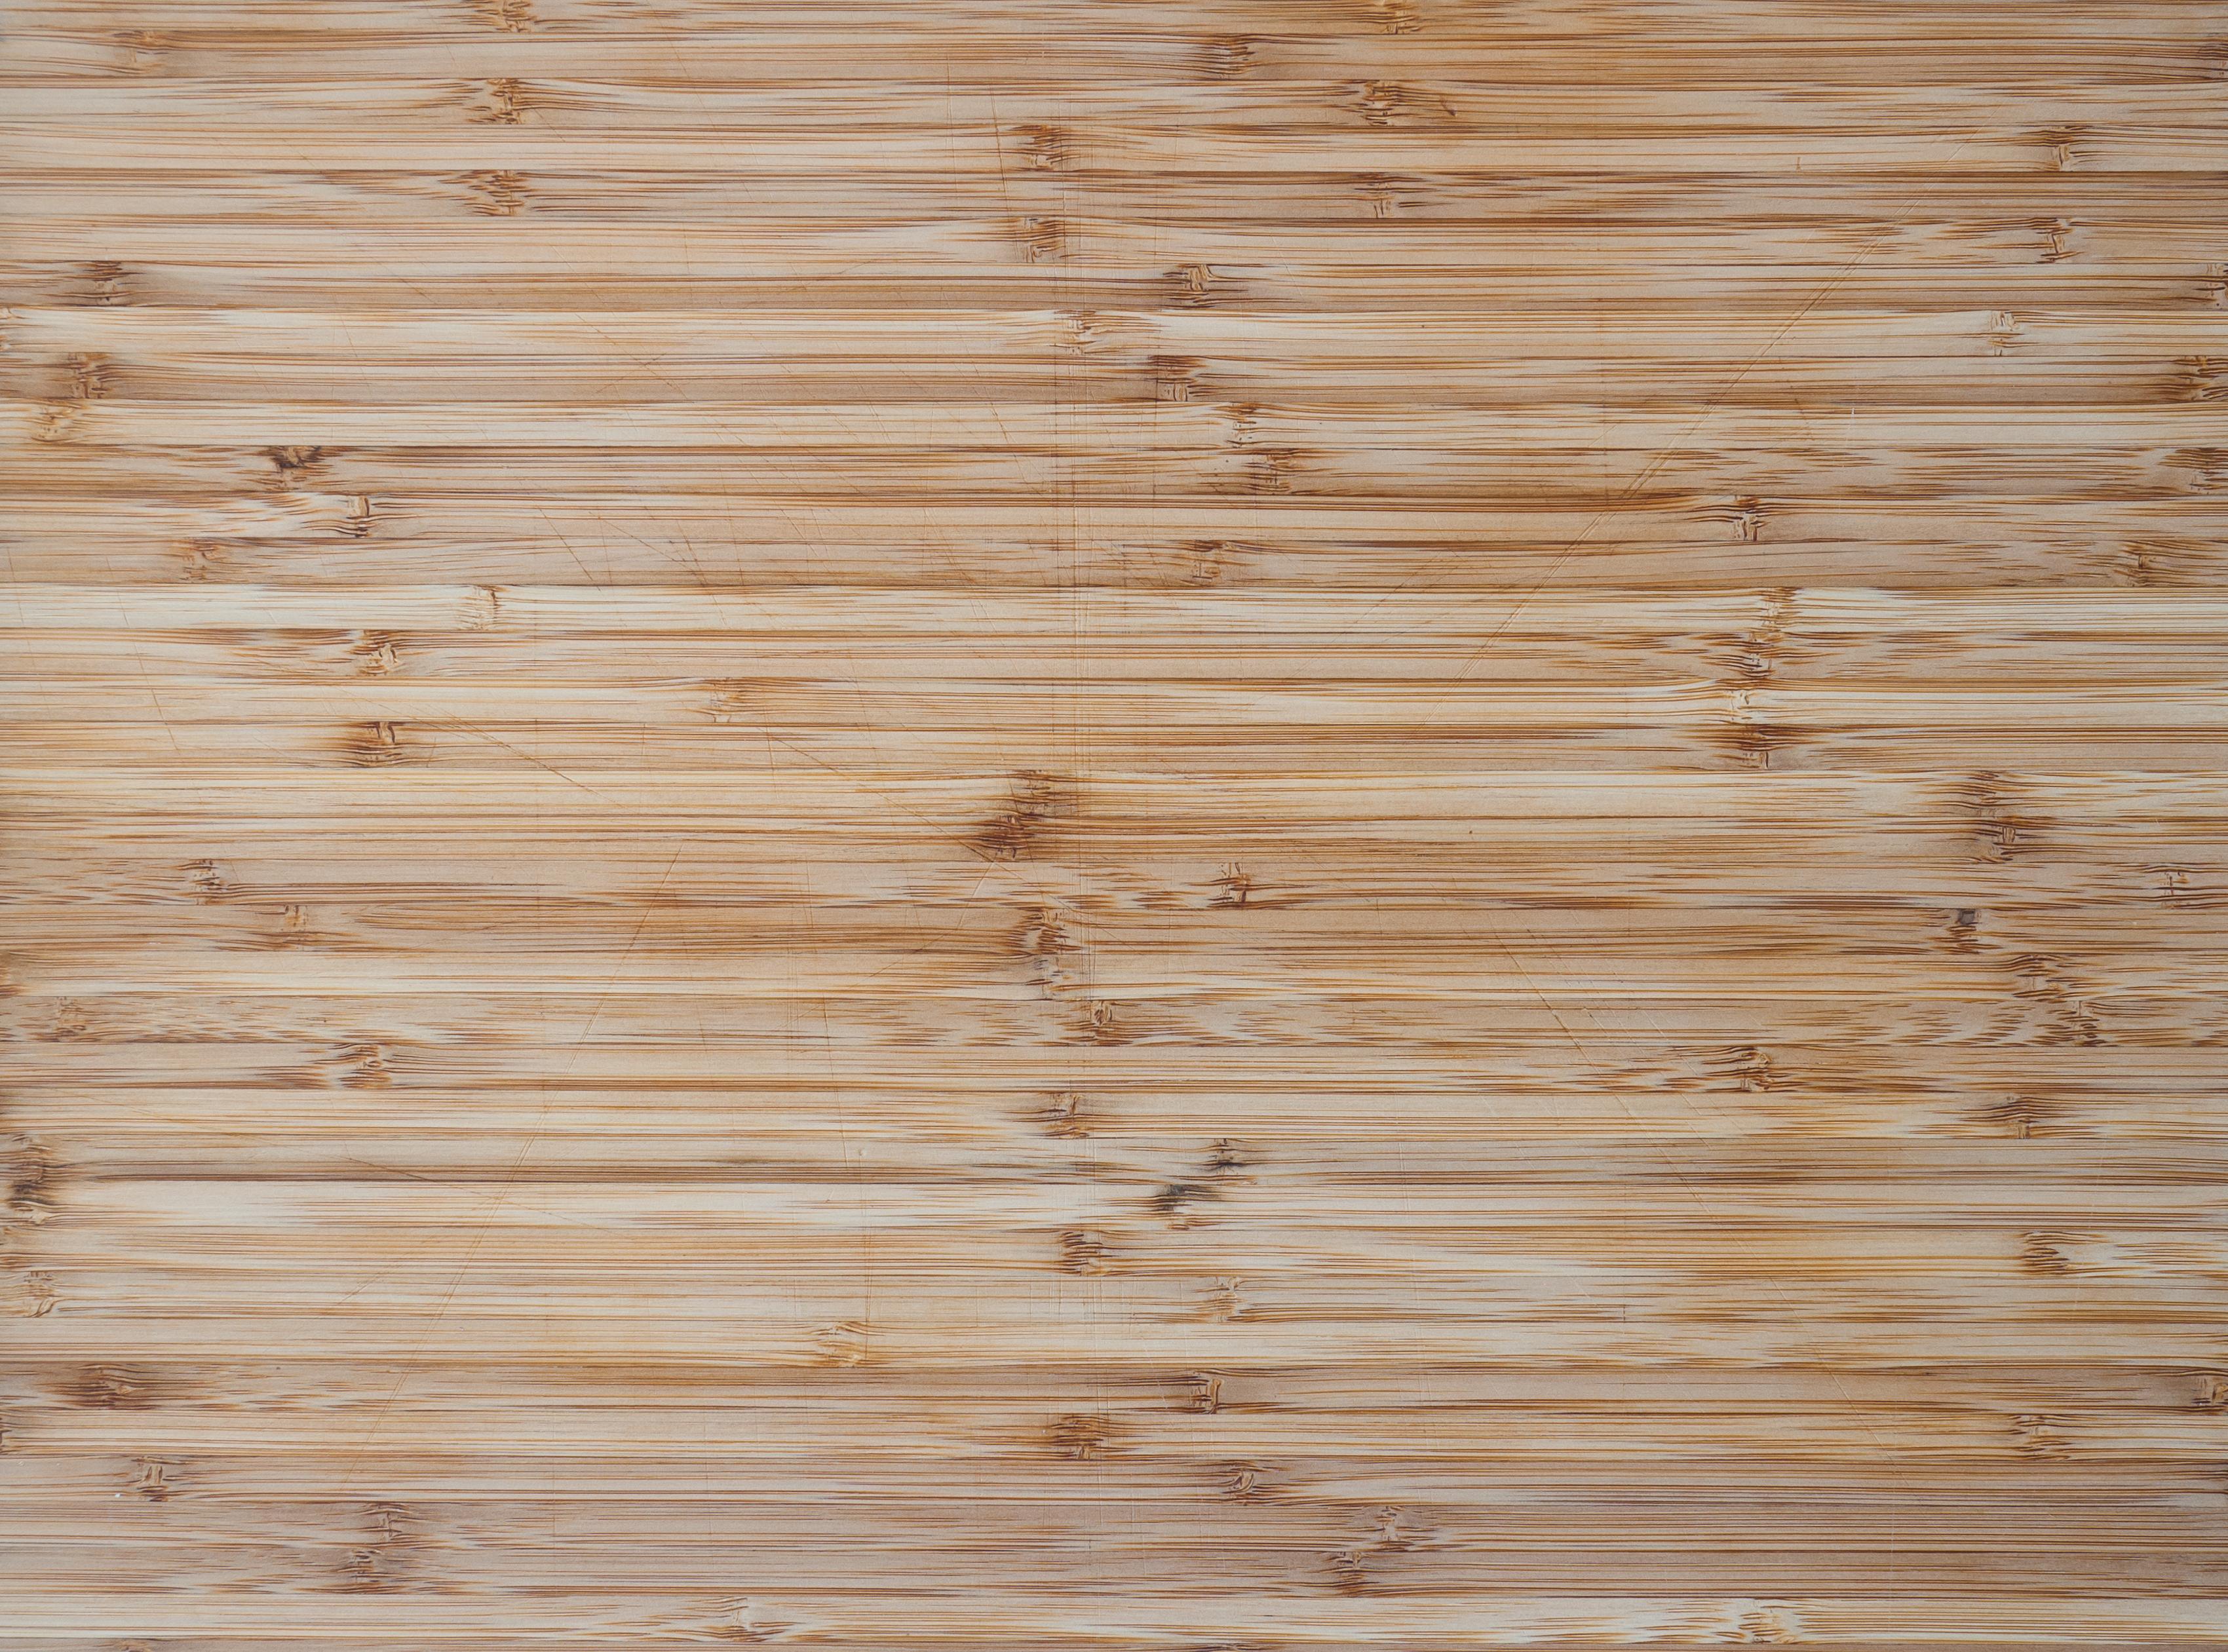 Wood Cutting Boards W Gripping Ring